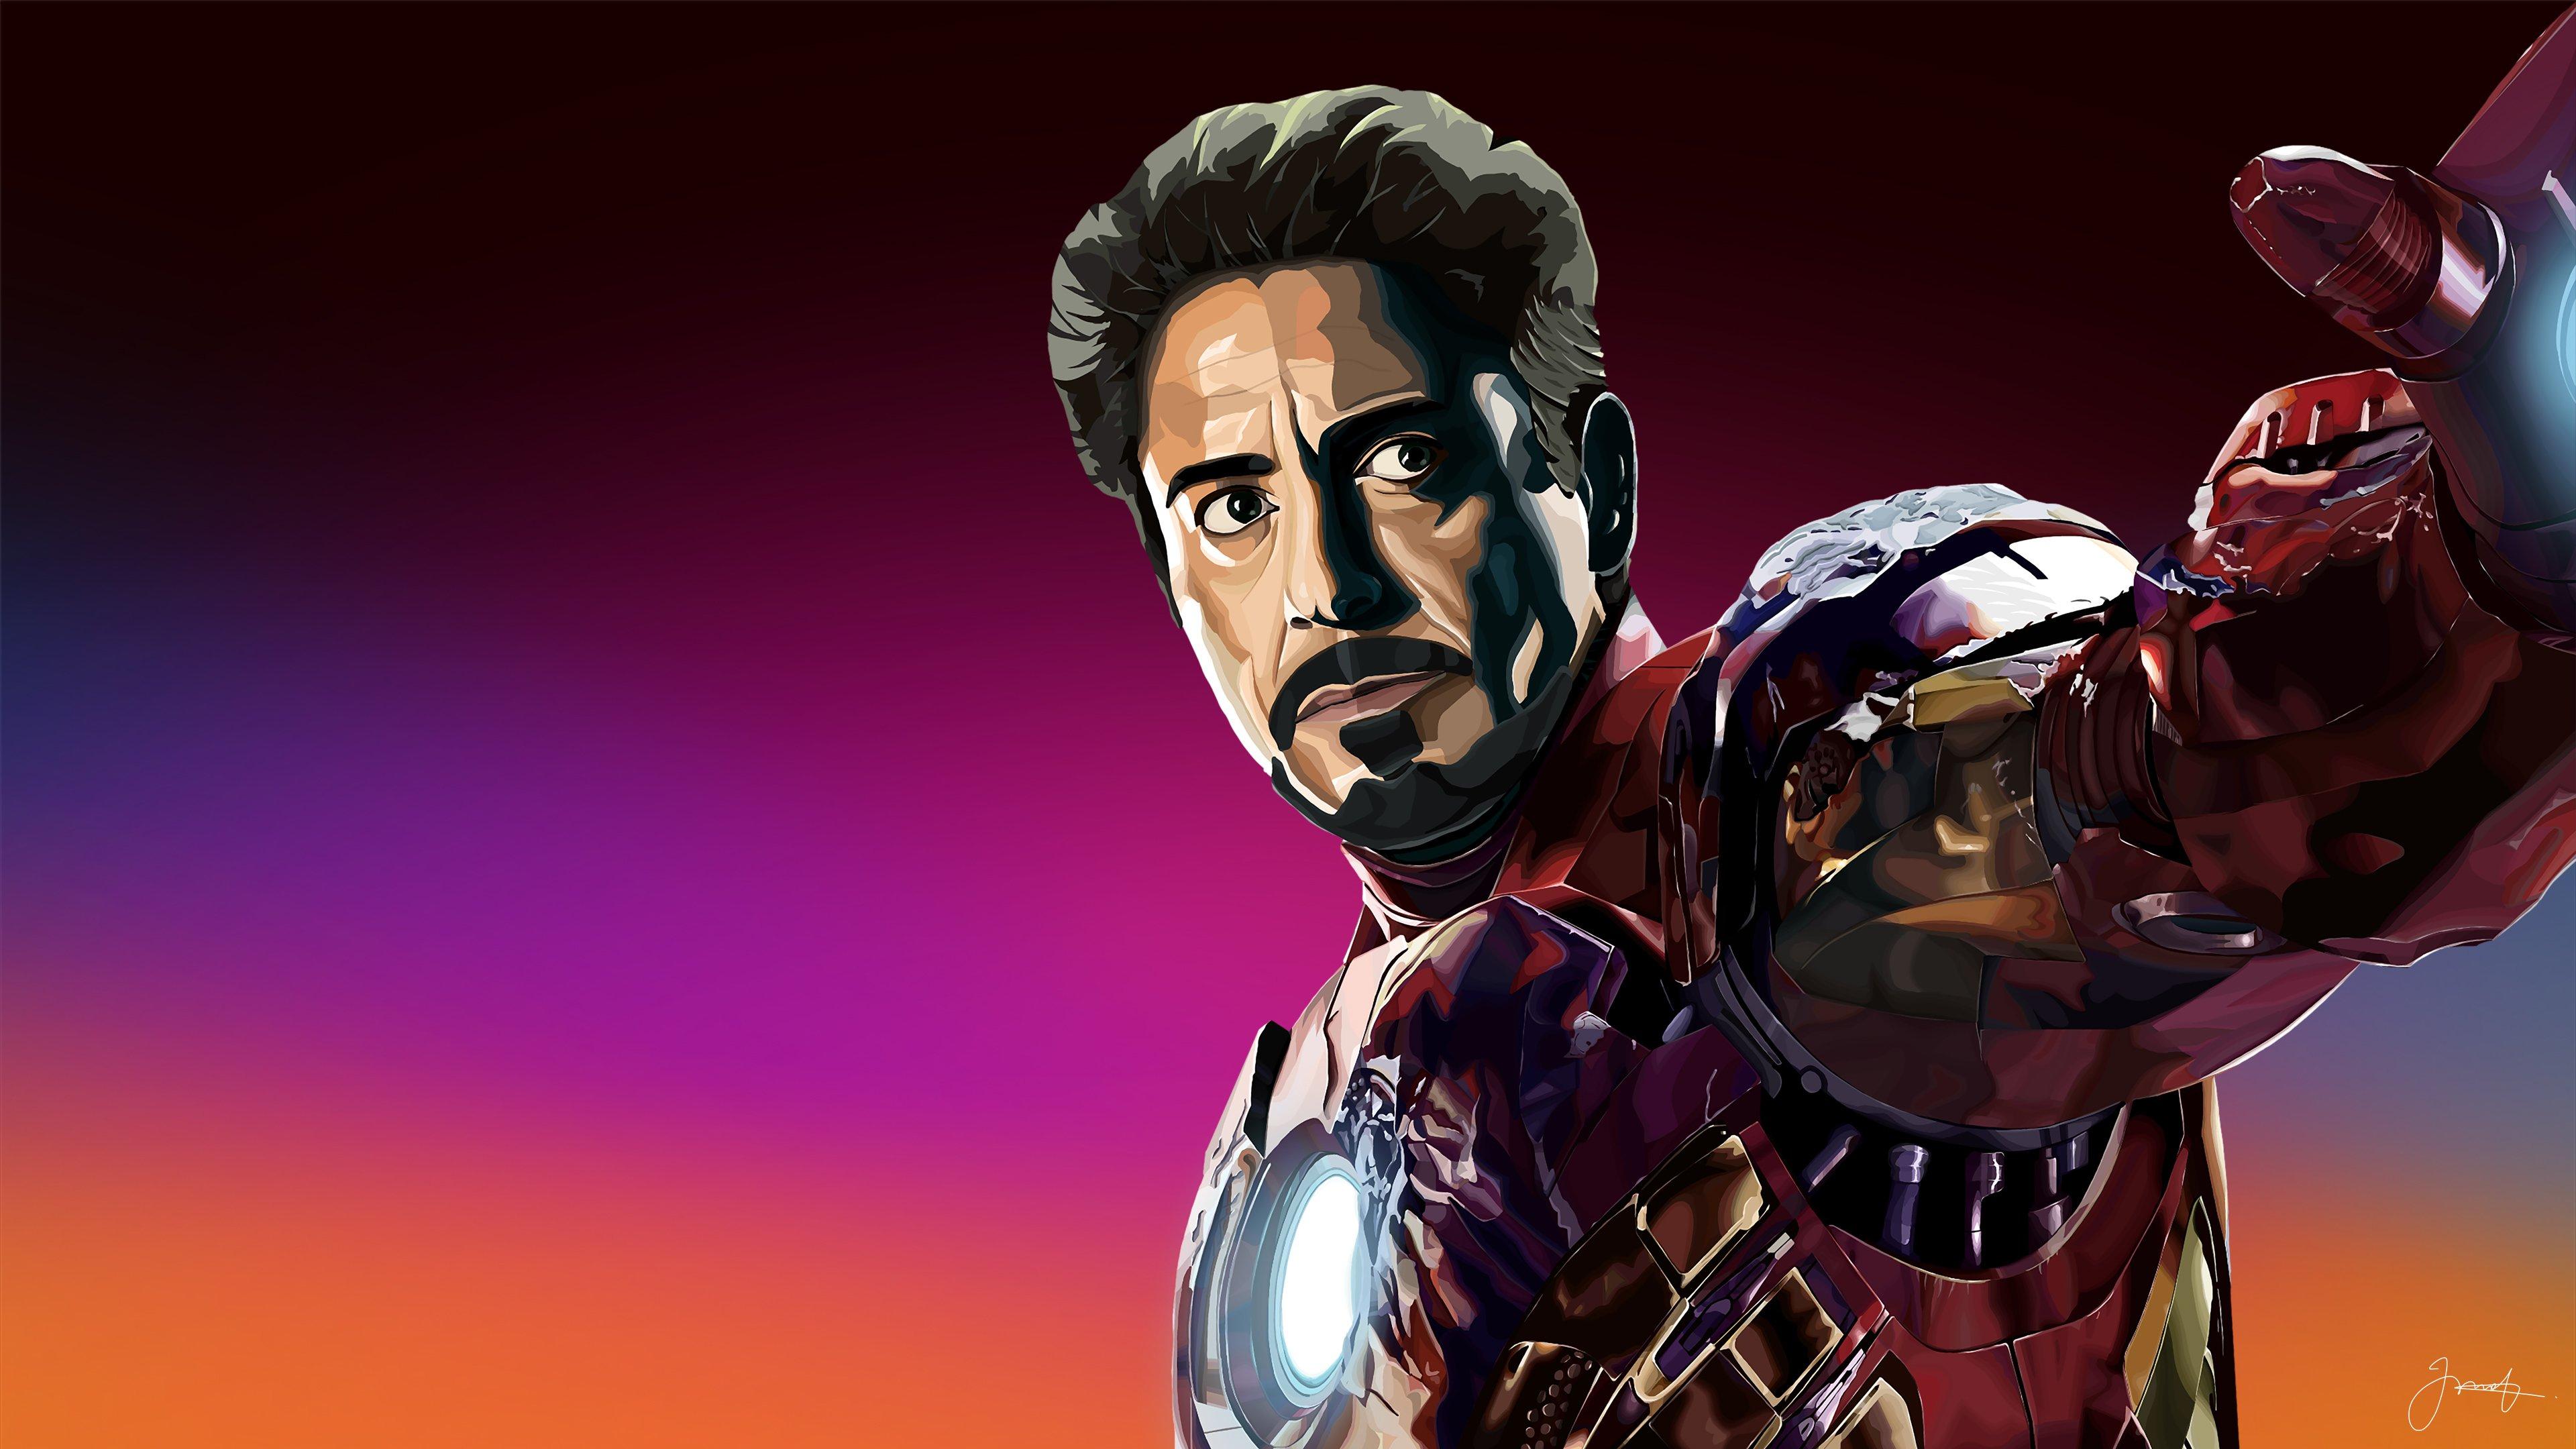 Wallpaper Robert Downey Jr asTony Stark Iron Man Fanart